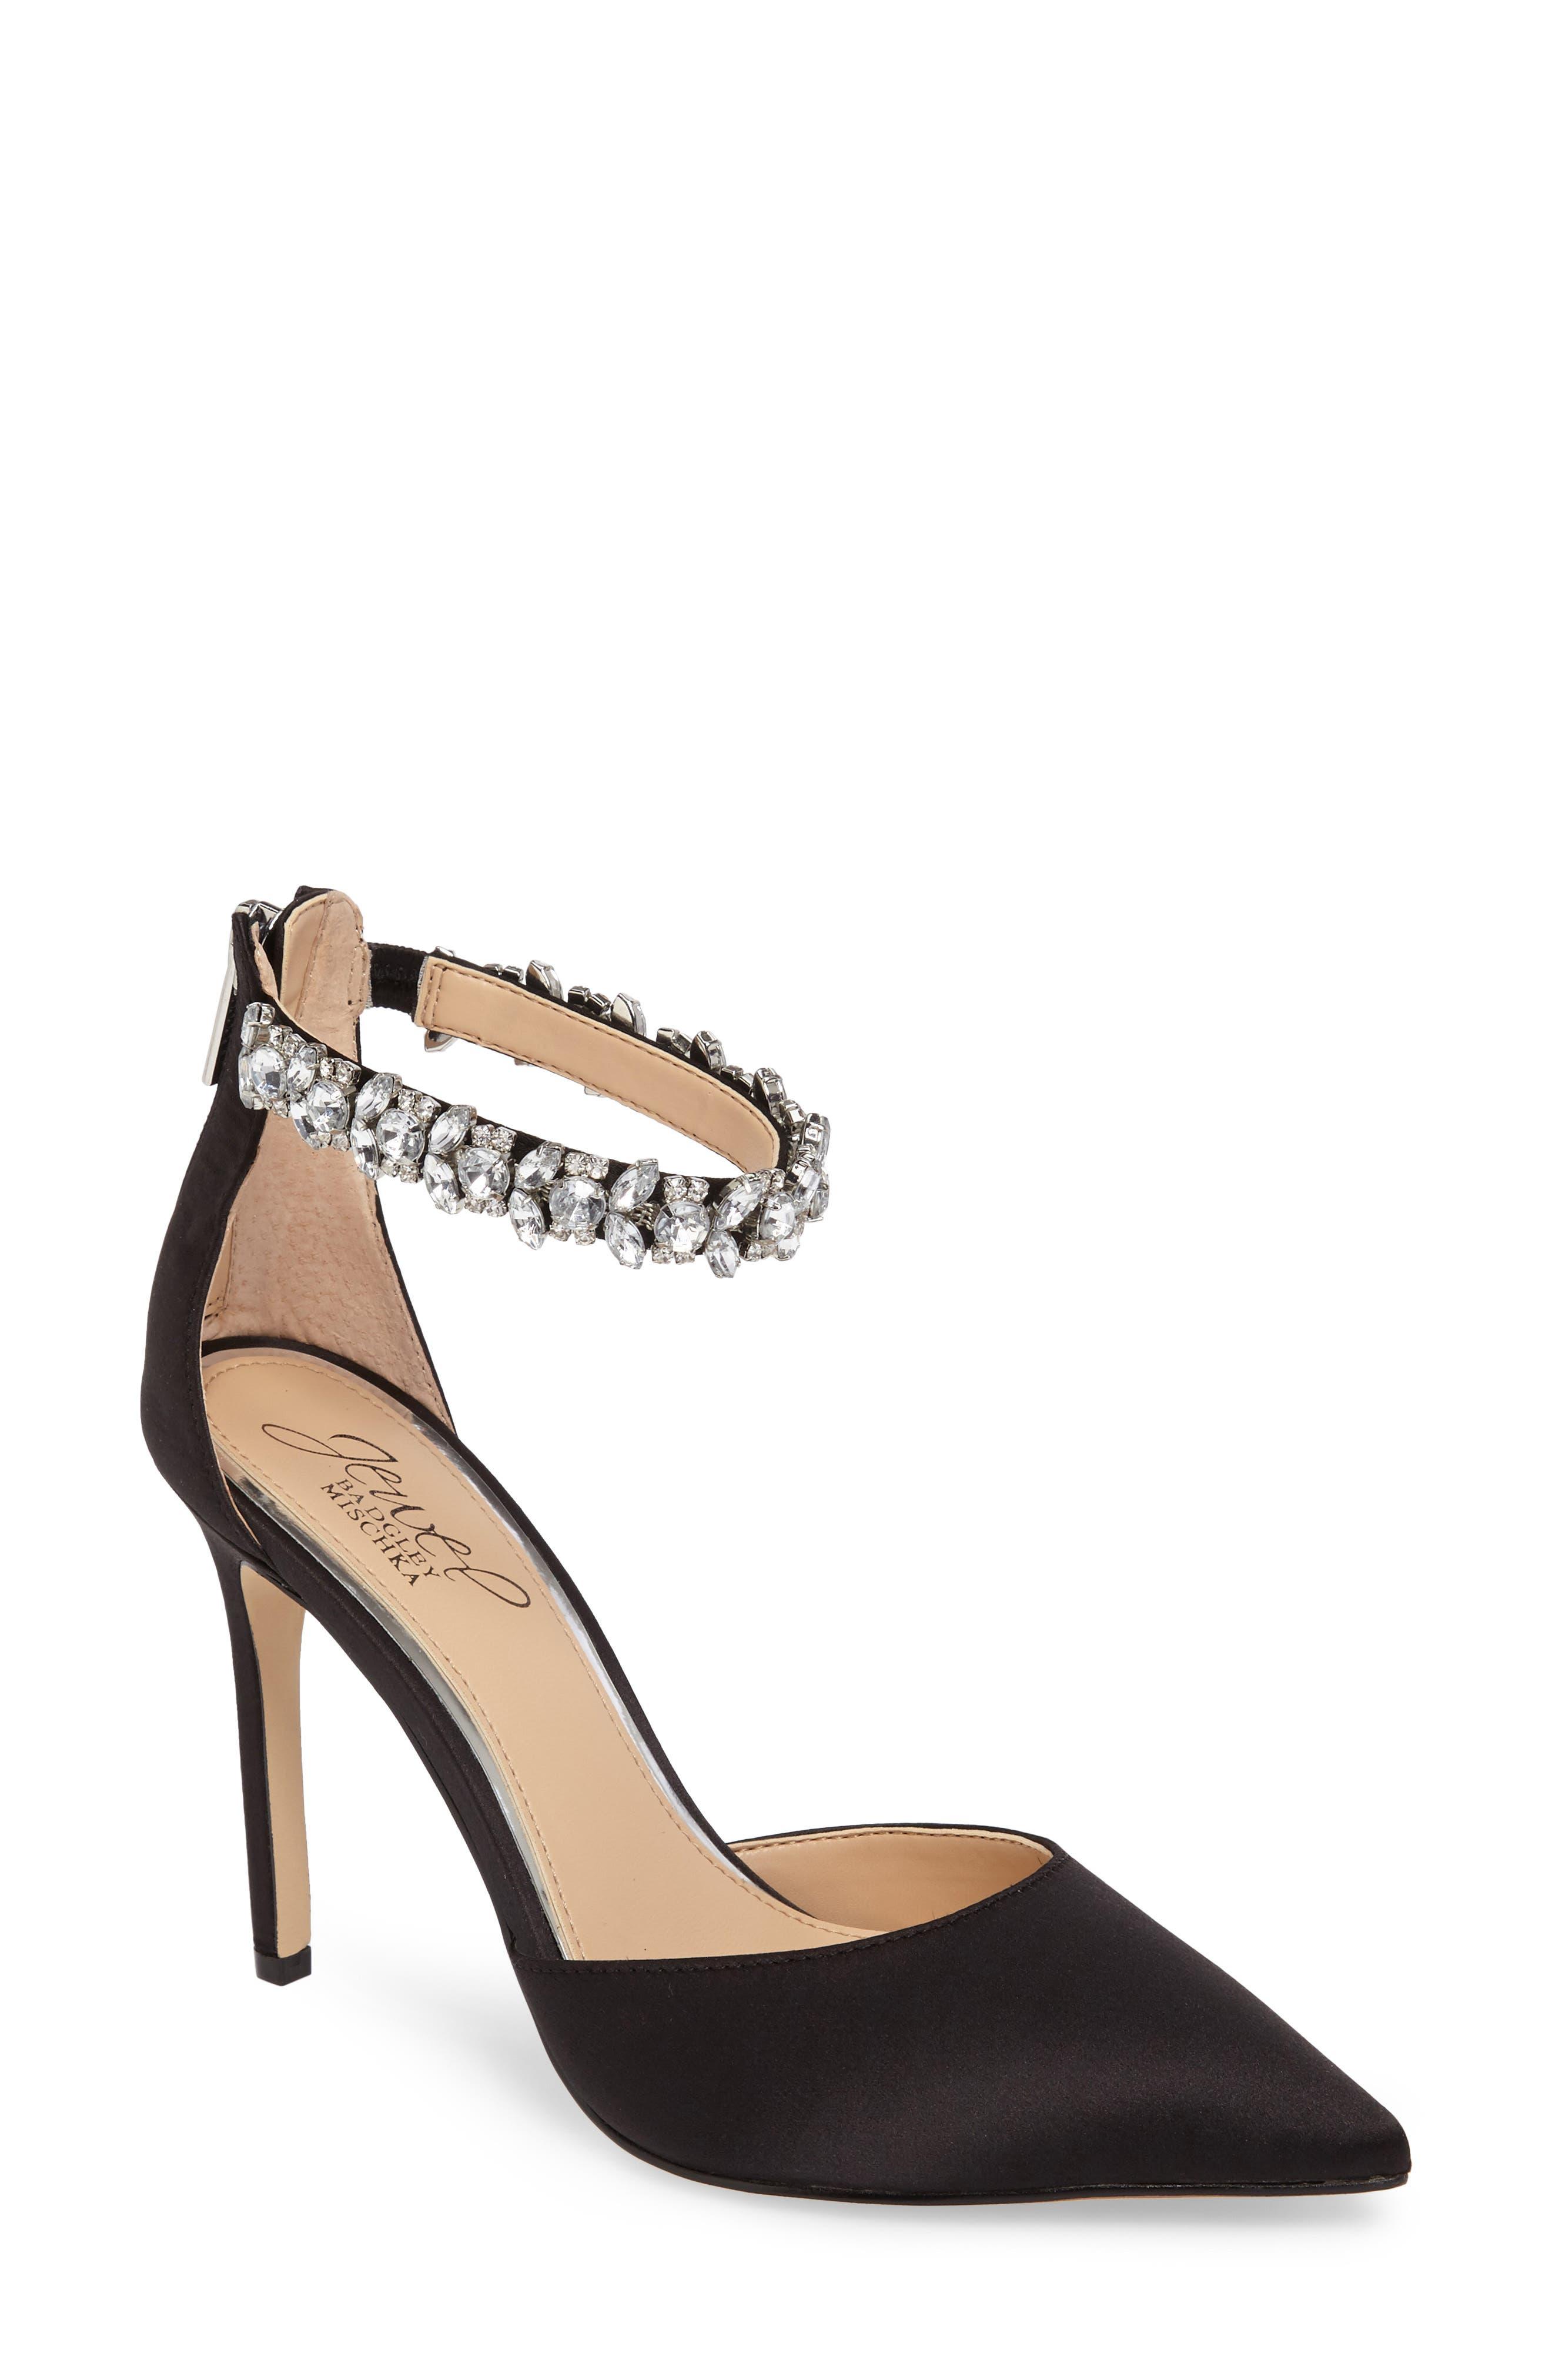 Alternate Image 1 Selected - Jewel Badgley Mischka Lizbeth Ankle Strap Pump (Women)